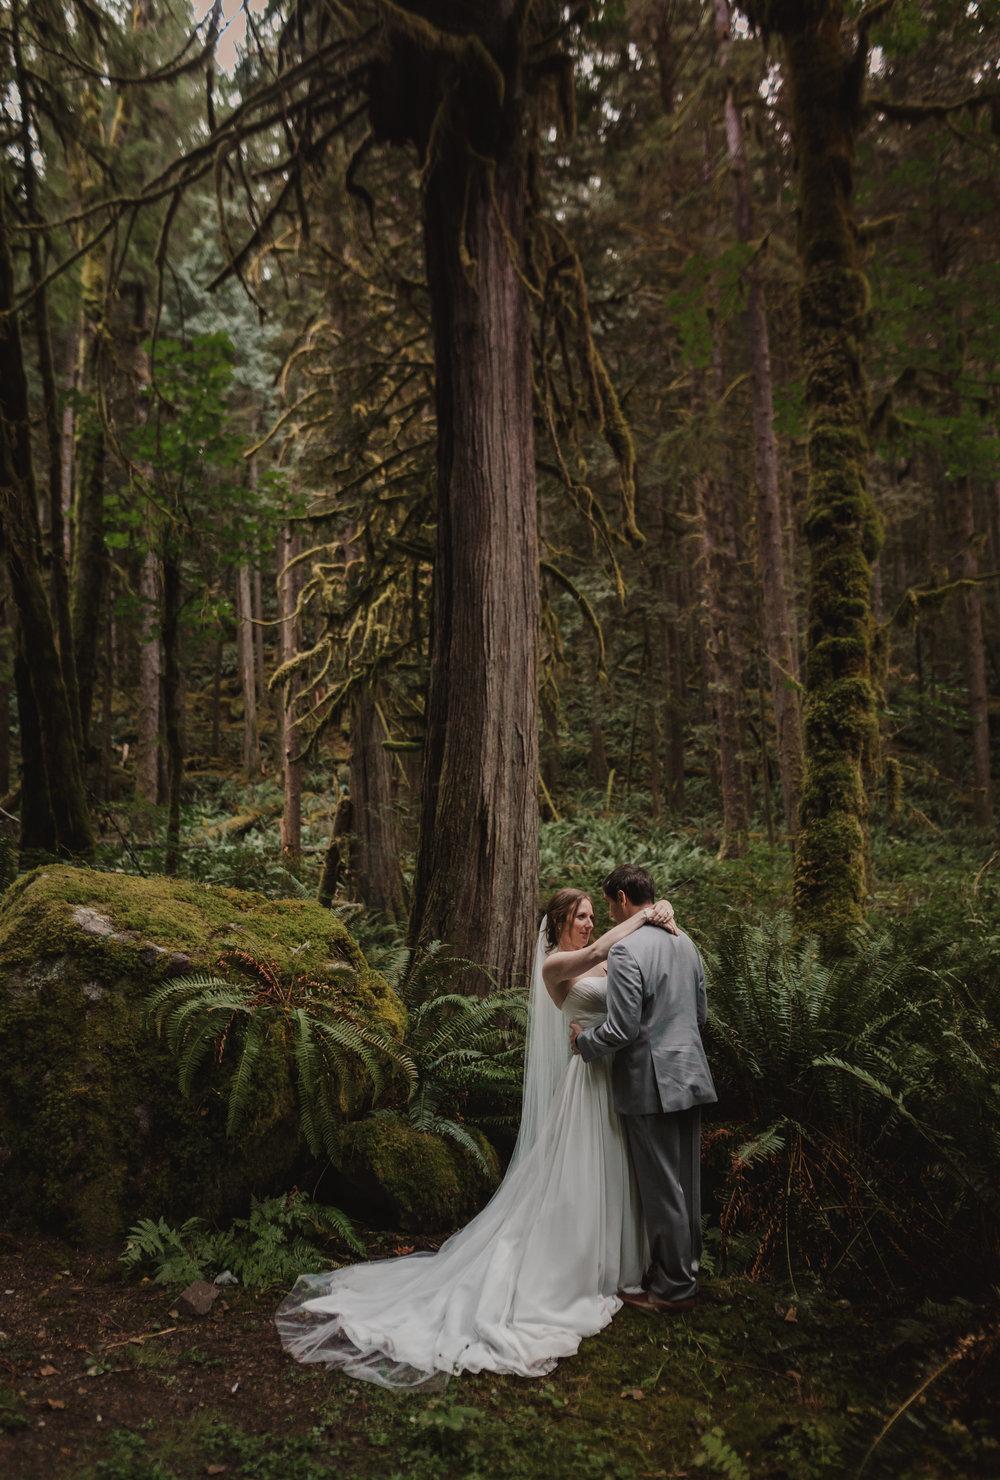 West Coast Wilderness Lodge Wedding Photos - Vancouver Wedding Photographer & Videographer - Sunshine Coast Wedding Photos - Sunshine Coast Wedding Photographer - Jennifer Picard Photography - IMG_7133.jpg